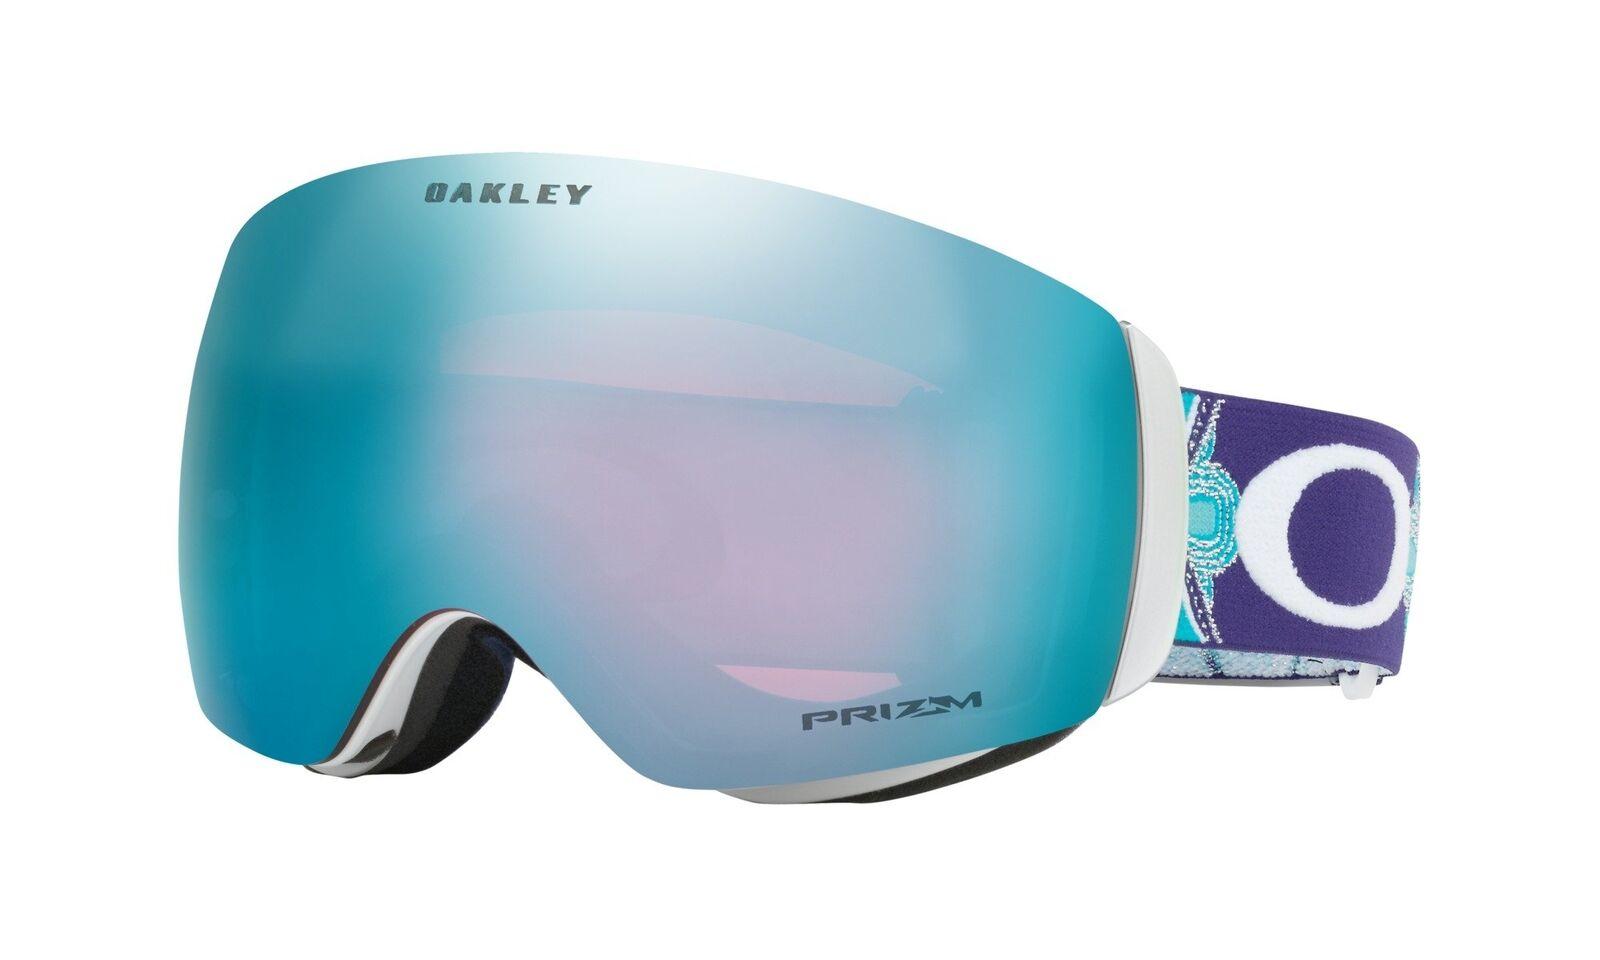 7c6c4d298805 Oakley Flight Deck XM Jamie Anderson Prizm Snow Goggles Wanderlust Ice for  sale online